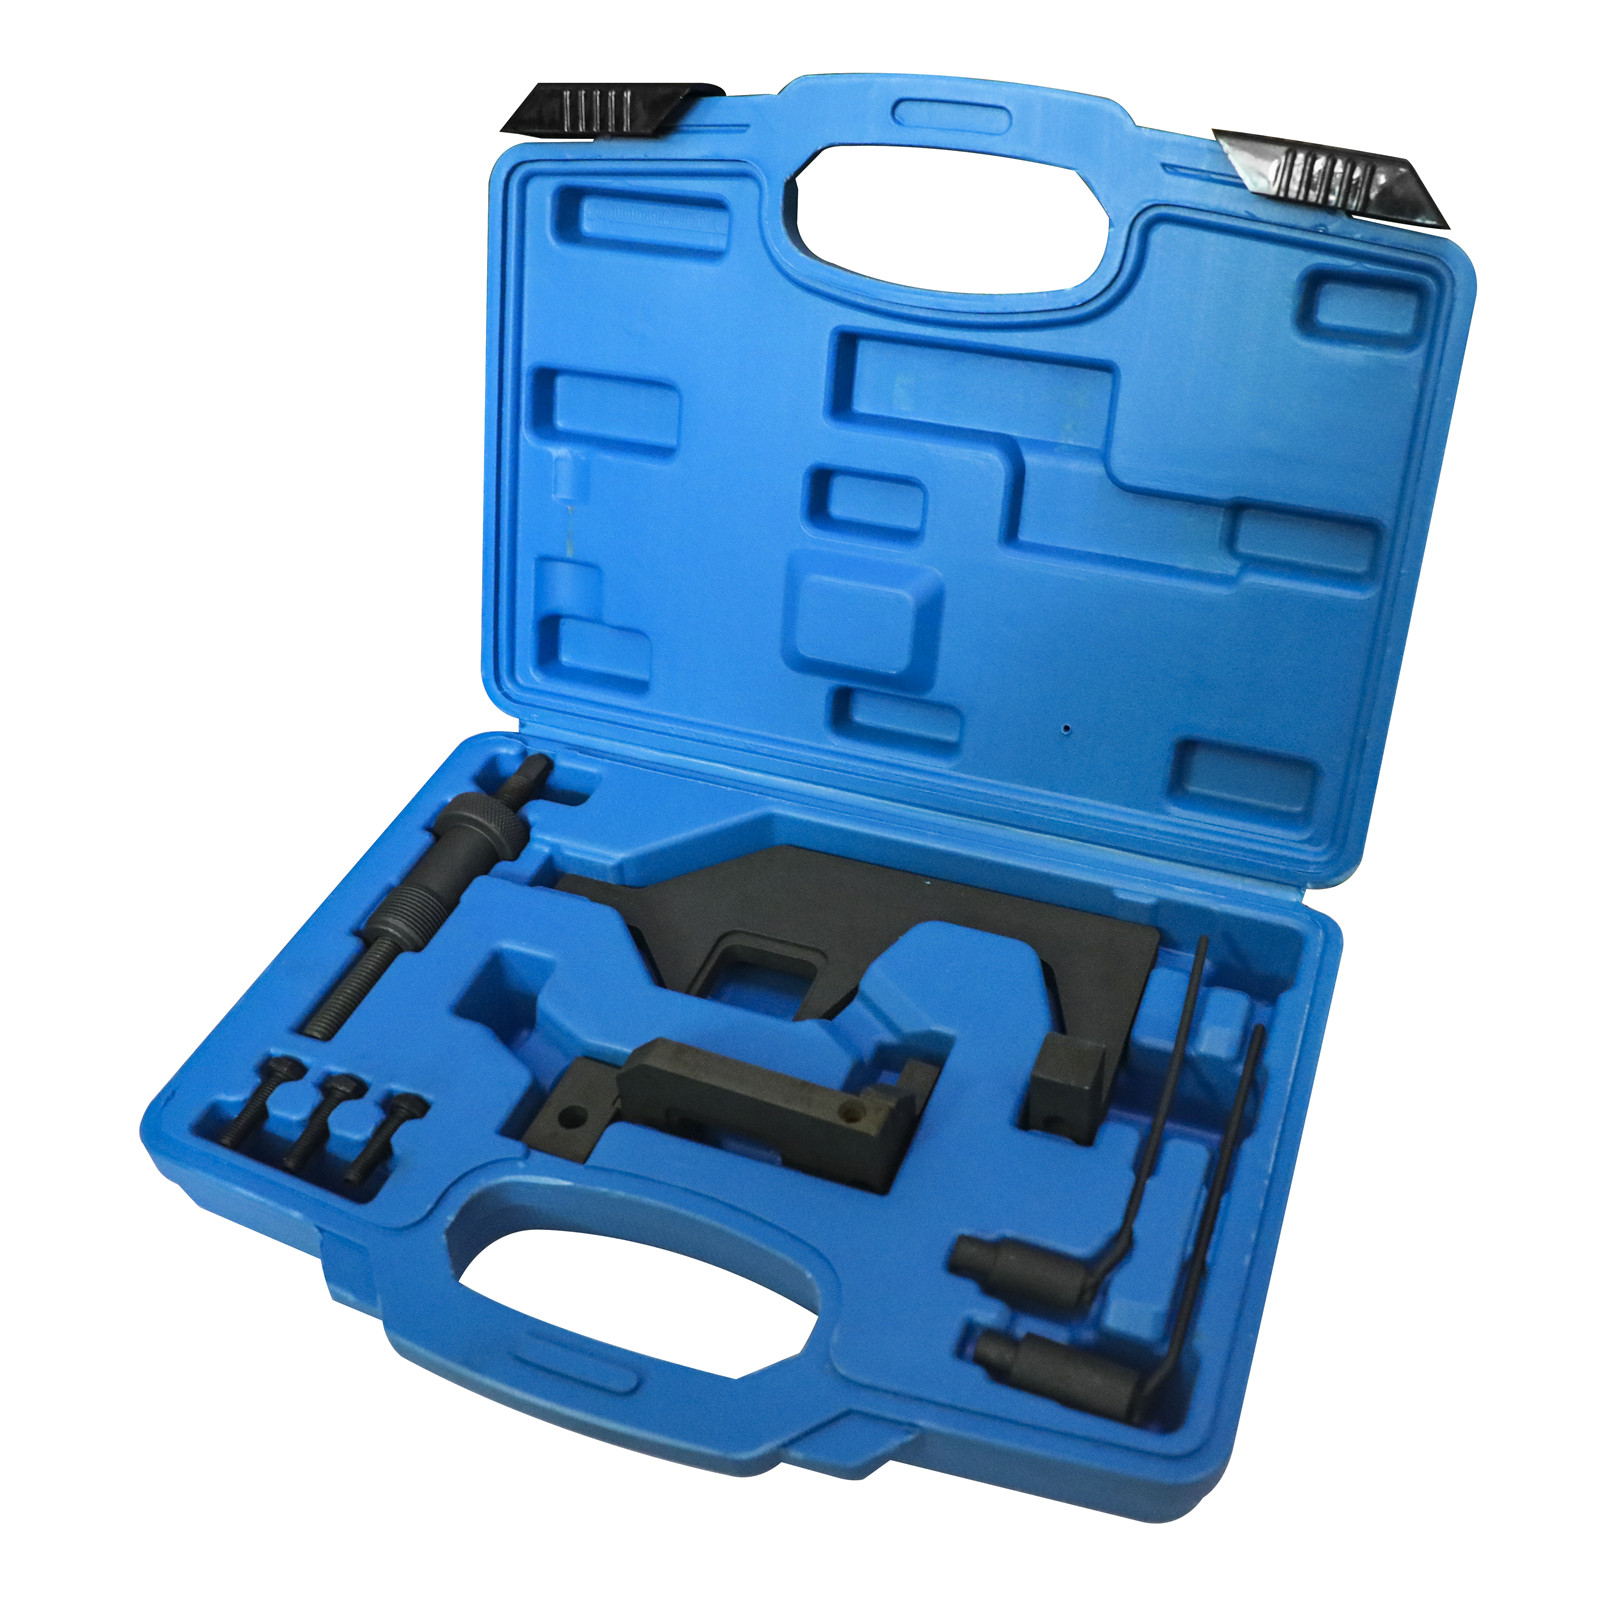 Motor Timing Tool Set Voor Bmw Mini Cooper Clubman N13, N18, F20 14i 16i 18i F30 2.0